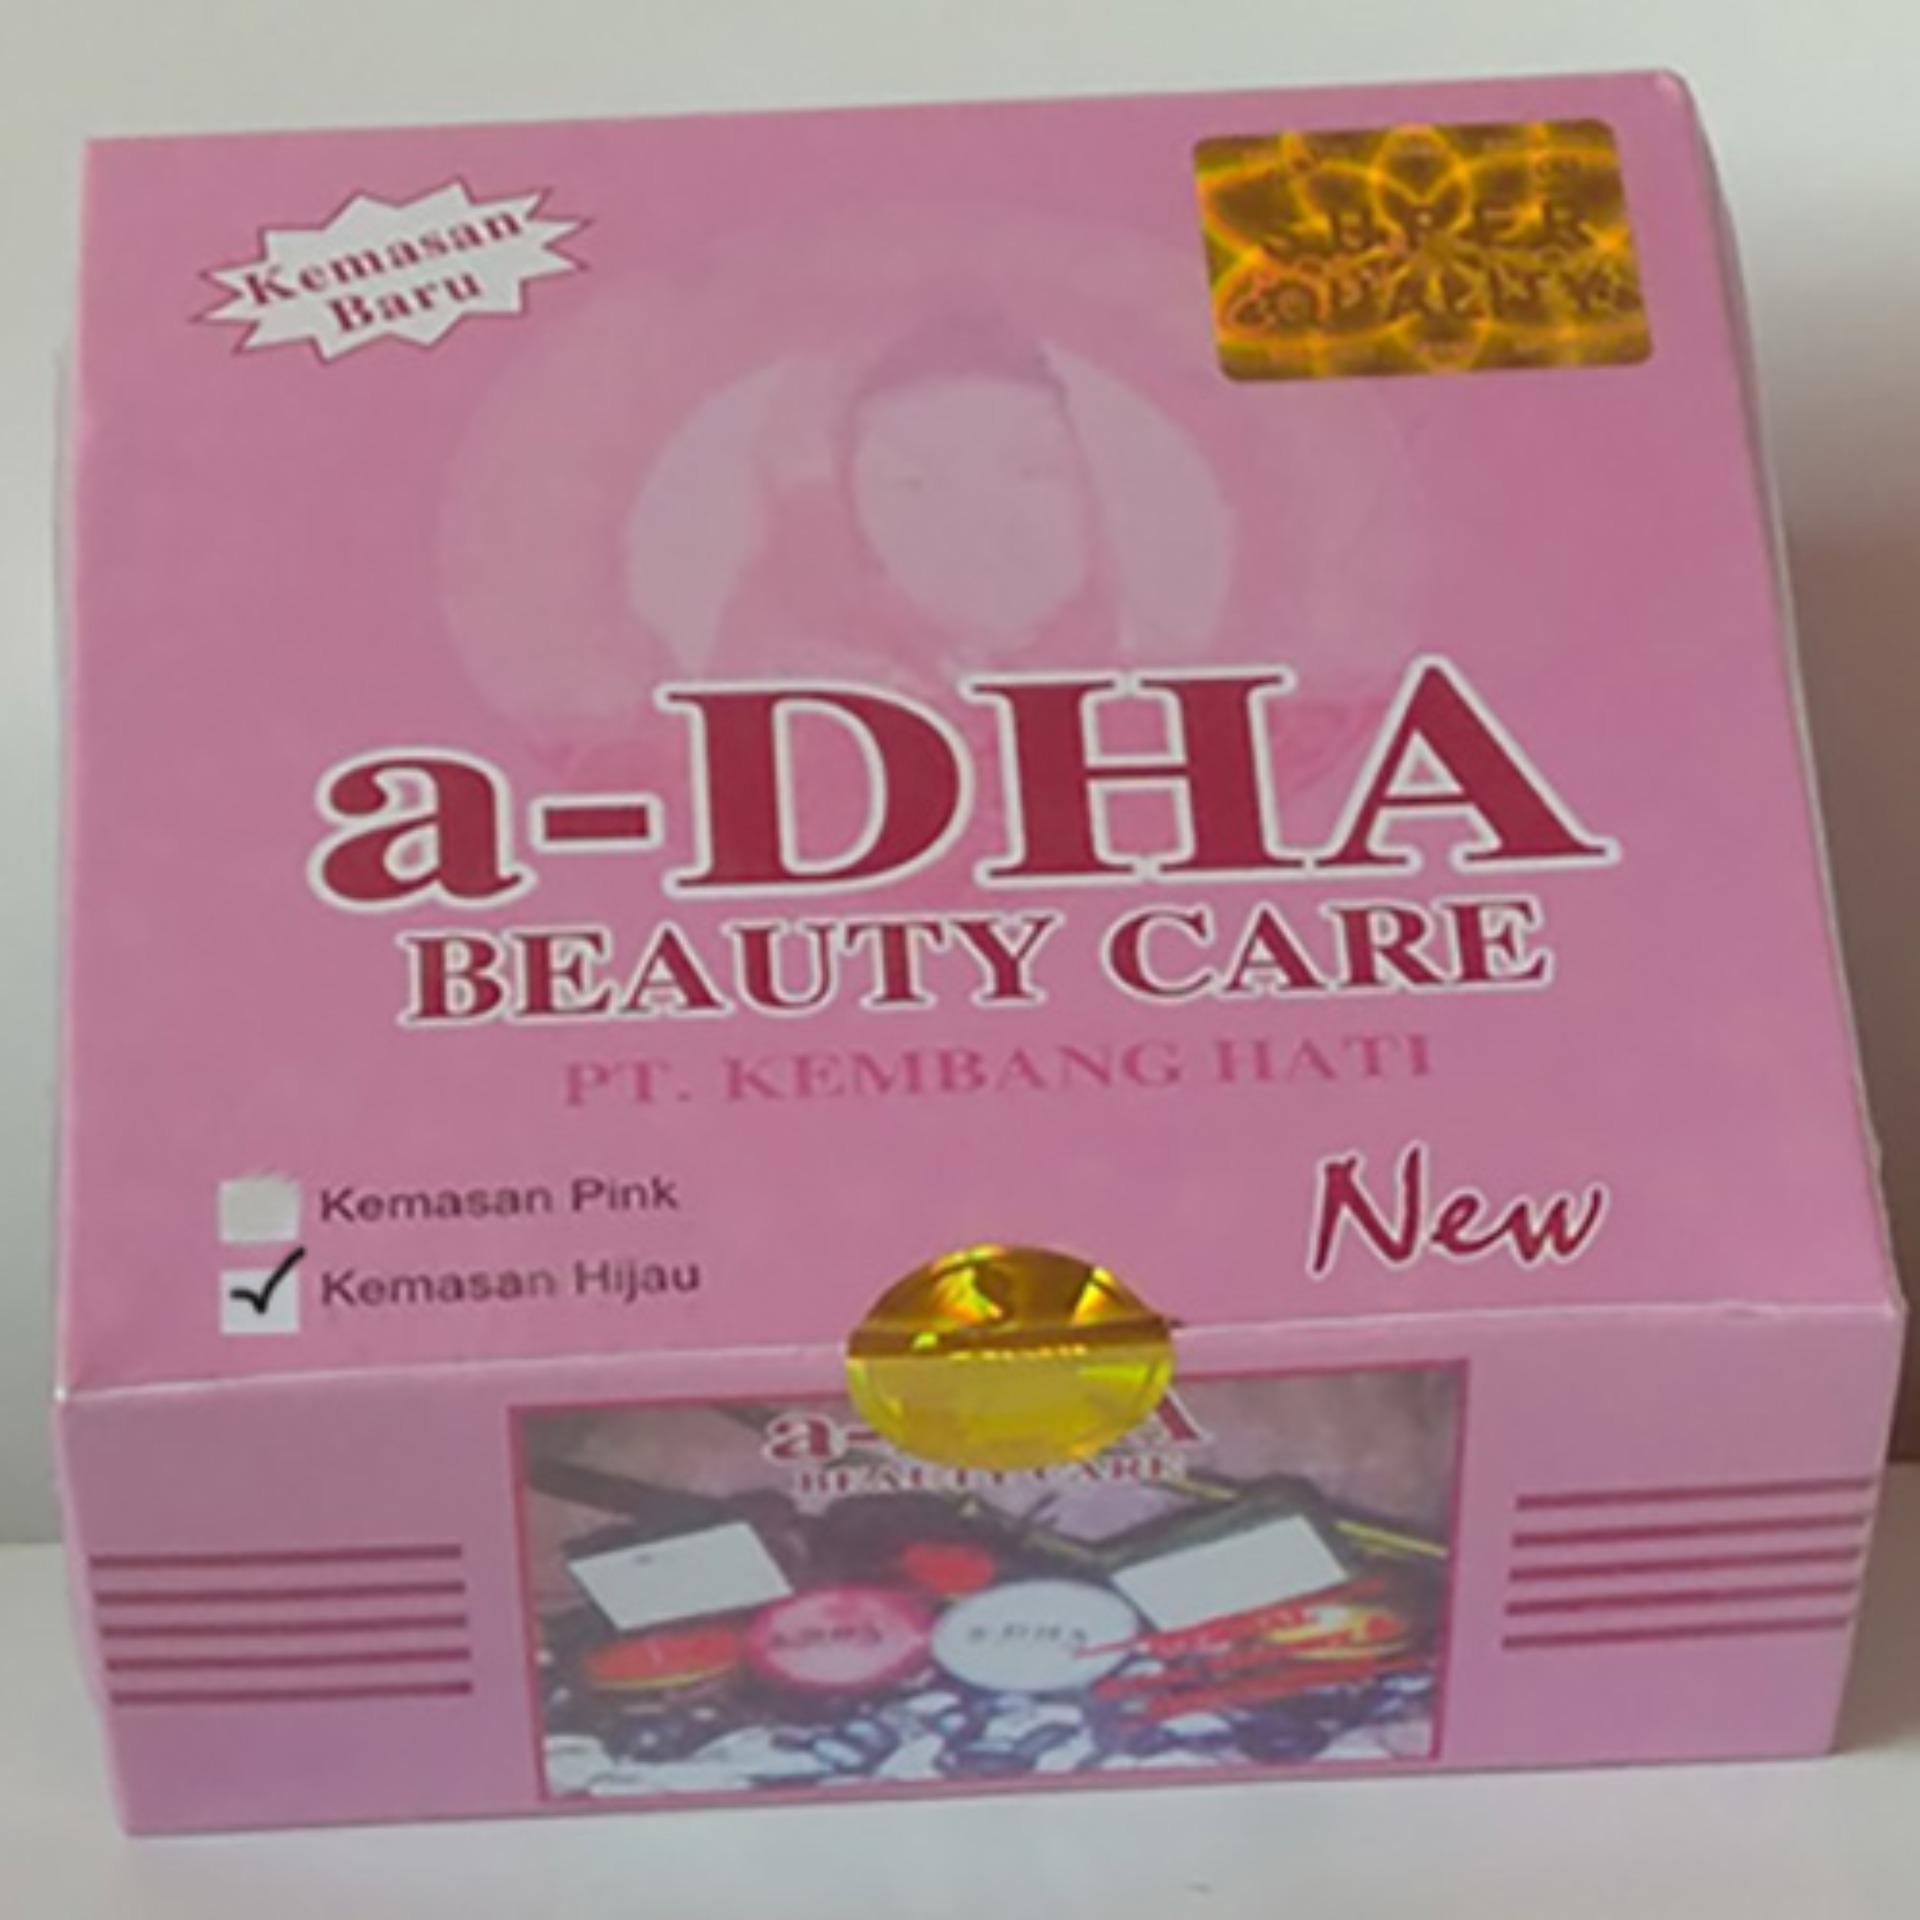 a DHA Paket Cream Pemutih Wajah Kemasan Baru Hijau Untuk 40 Tahun Keatas